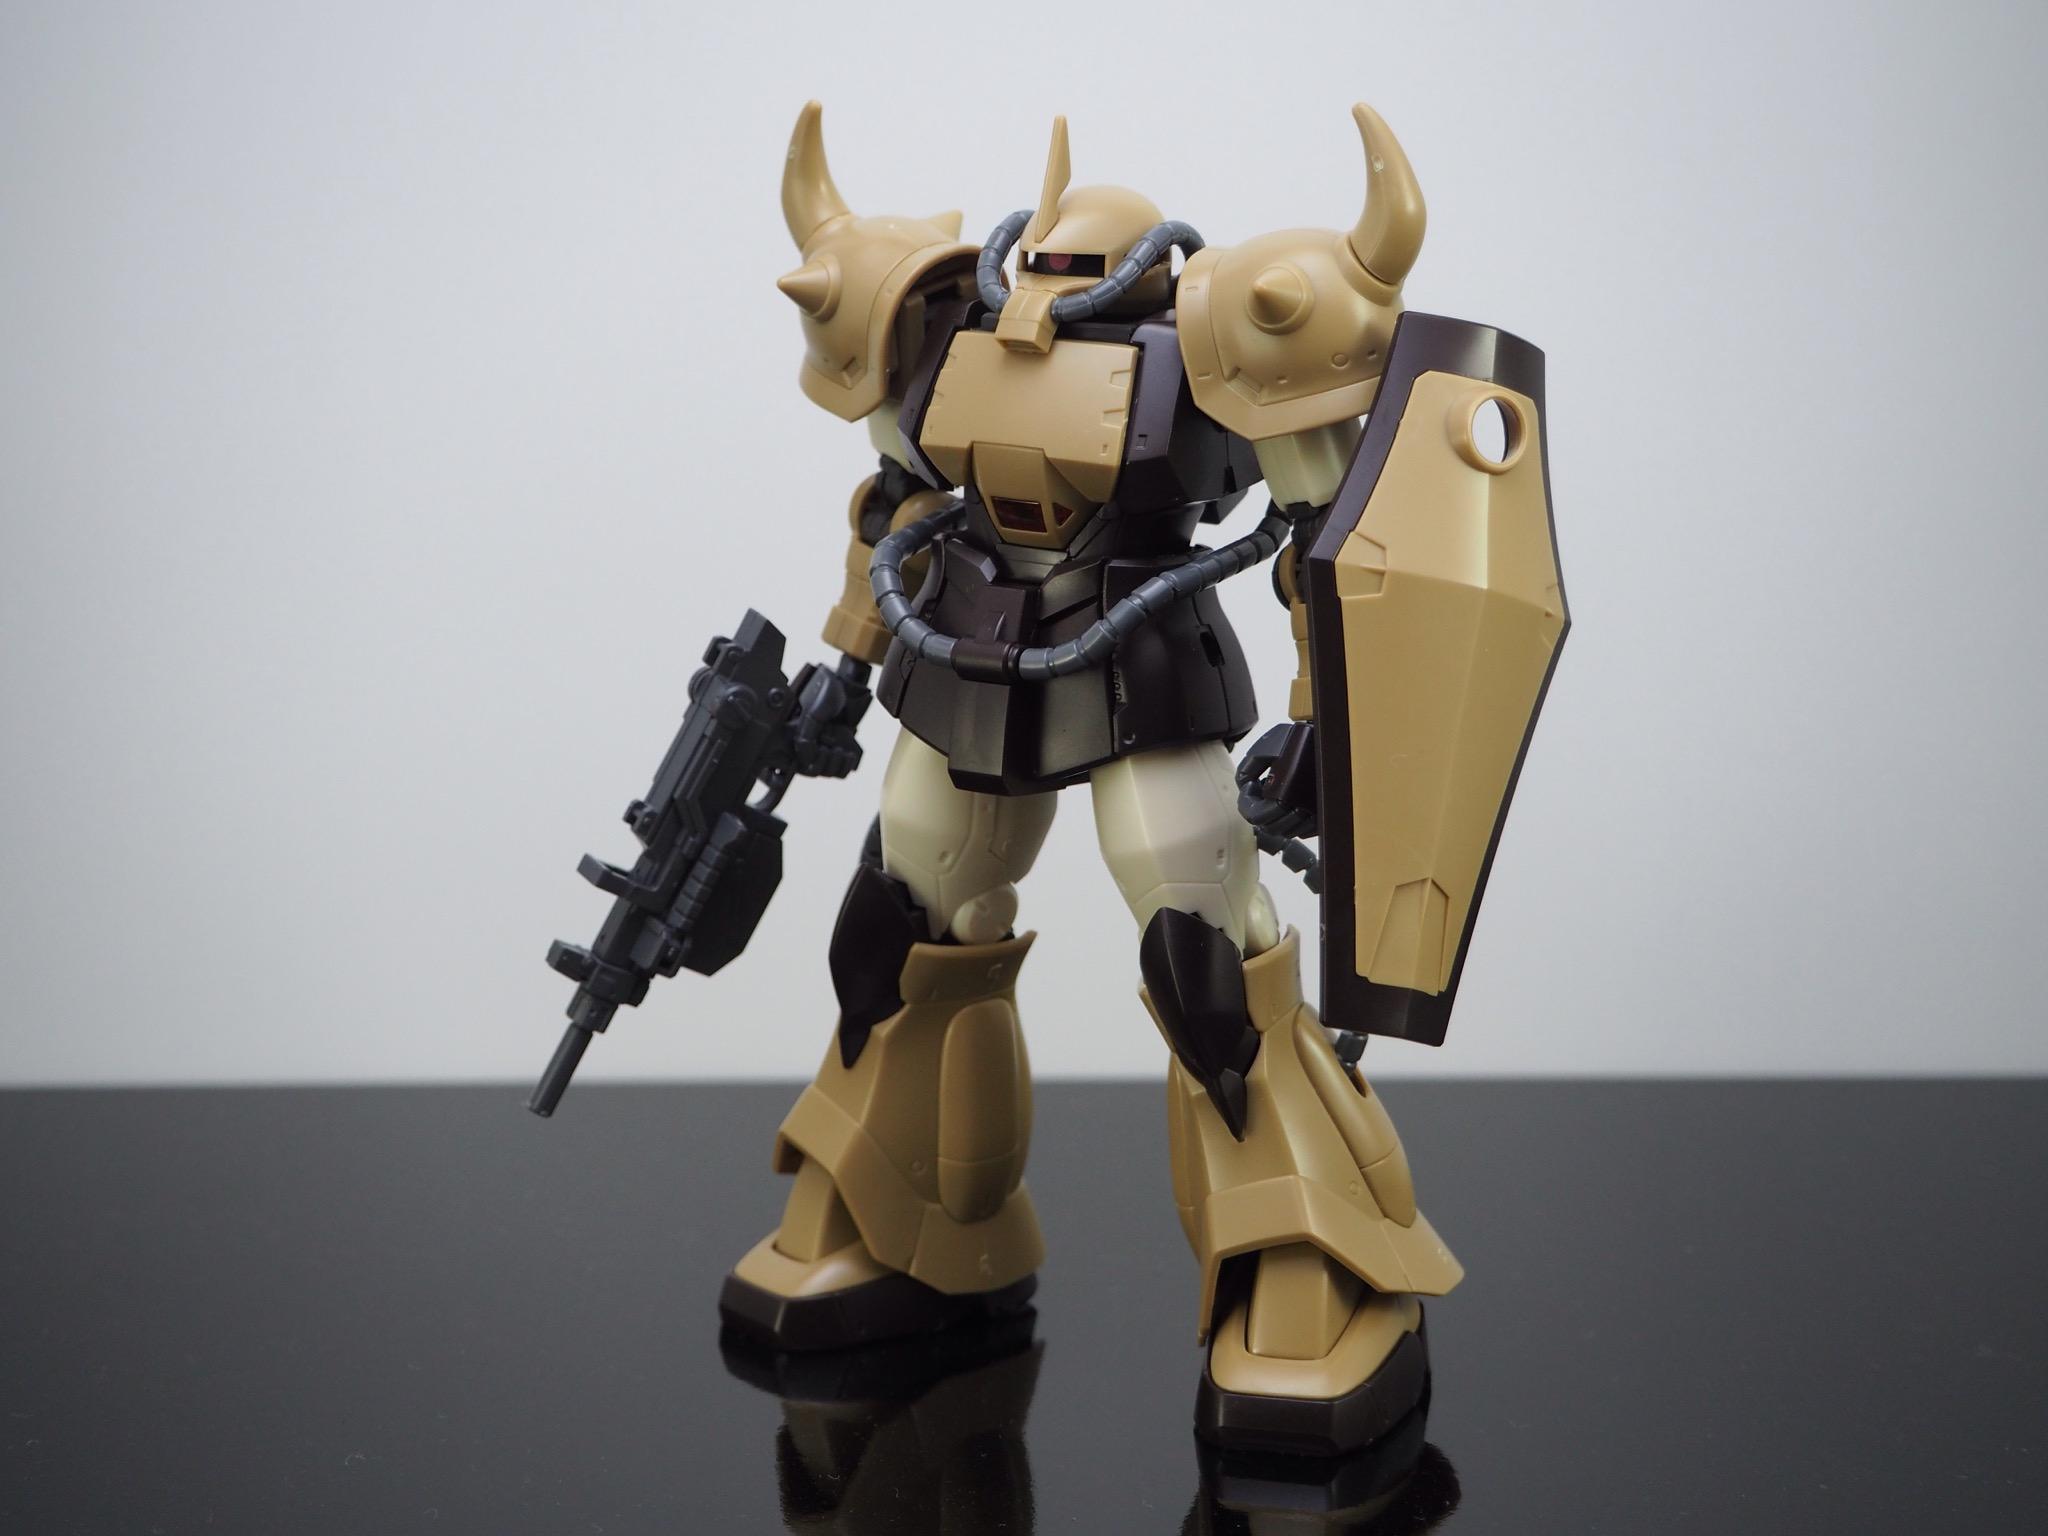 HG 1/144 YMS-07A-0 プロトタイプグフ(機動実証機サンドカラーVer) [Prototype Gouf (Mobility Demonstrator Sand Color)]